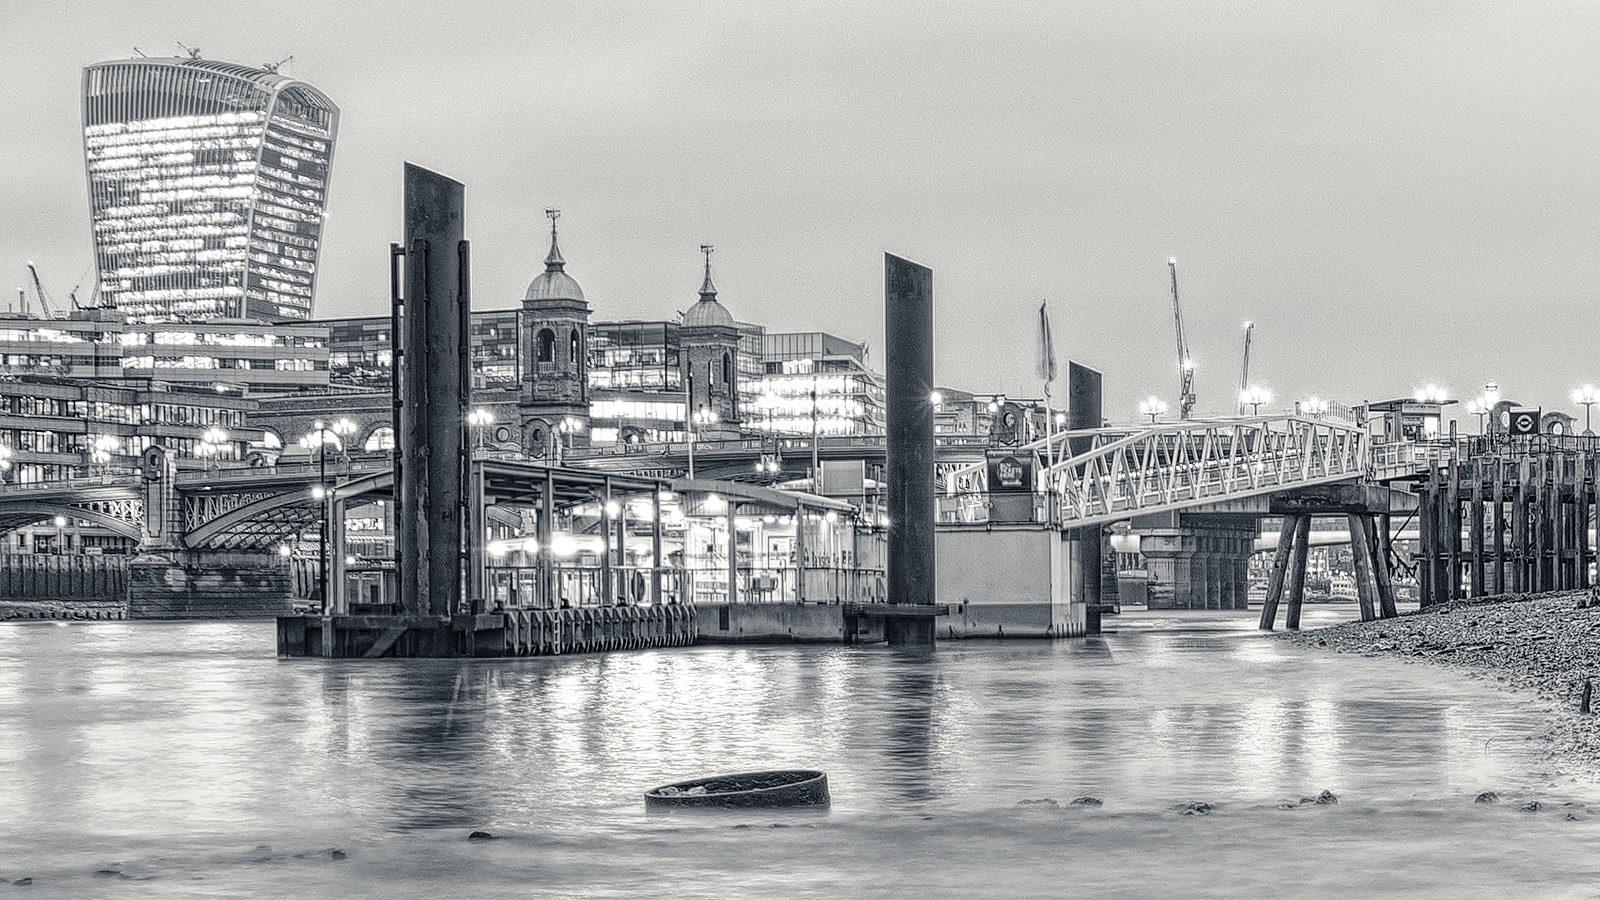 Under the Bridge Detail - View of the London Cityscape from underneath the Millennium Brige. London Black & White Fine Art Photograph.